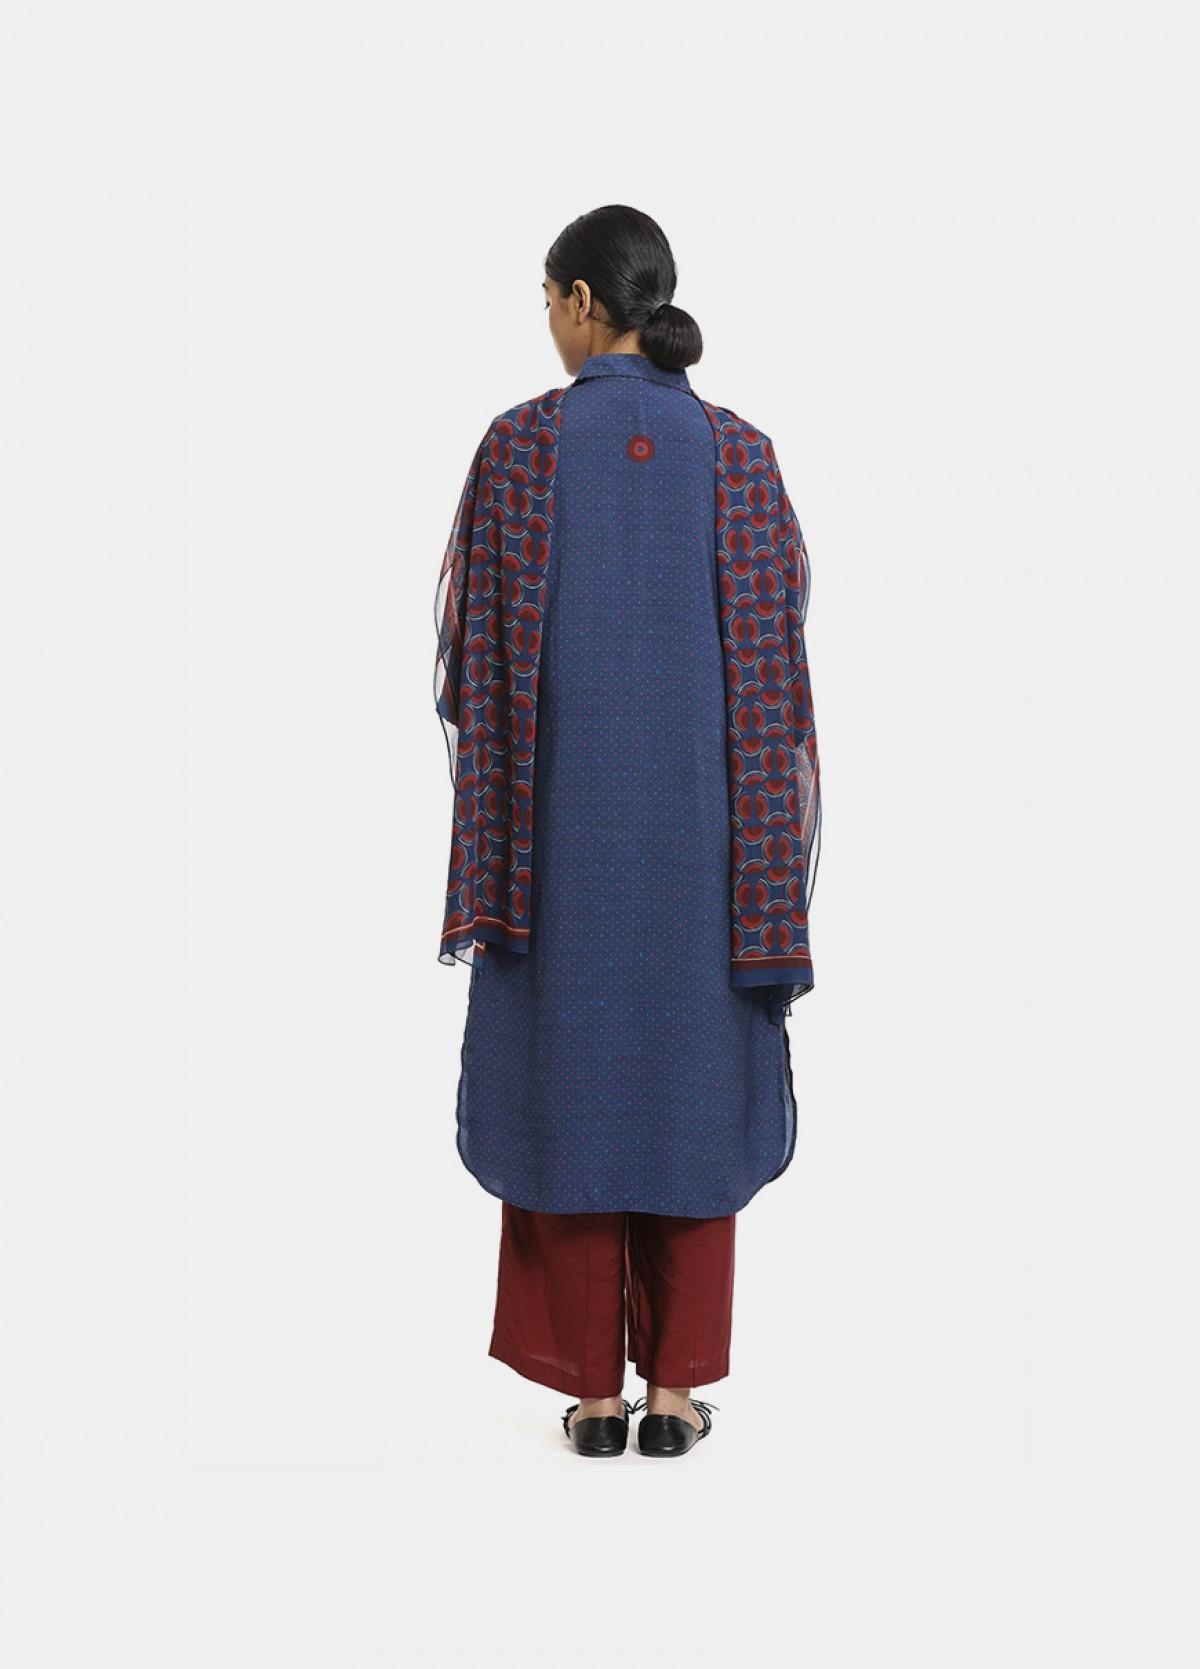 The Boond Indigo blue kurta set